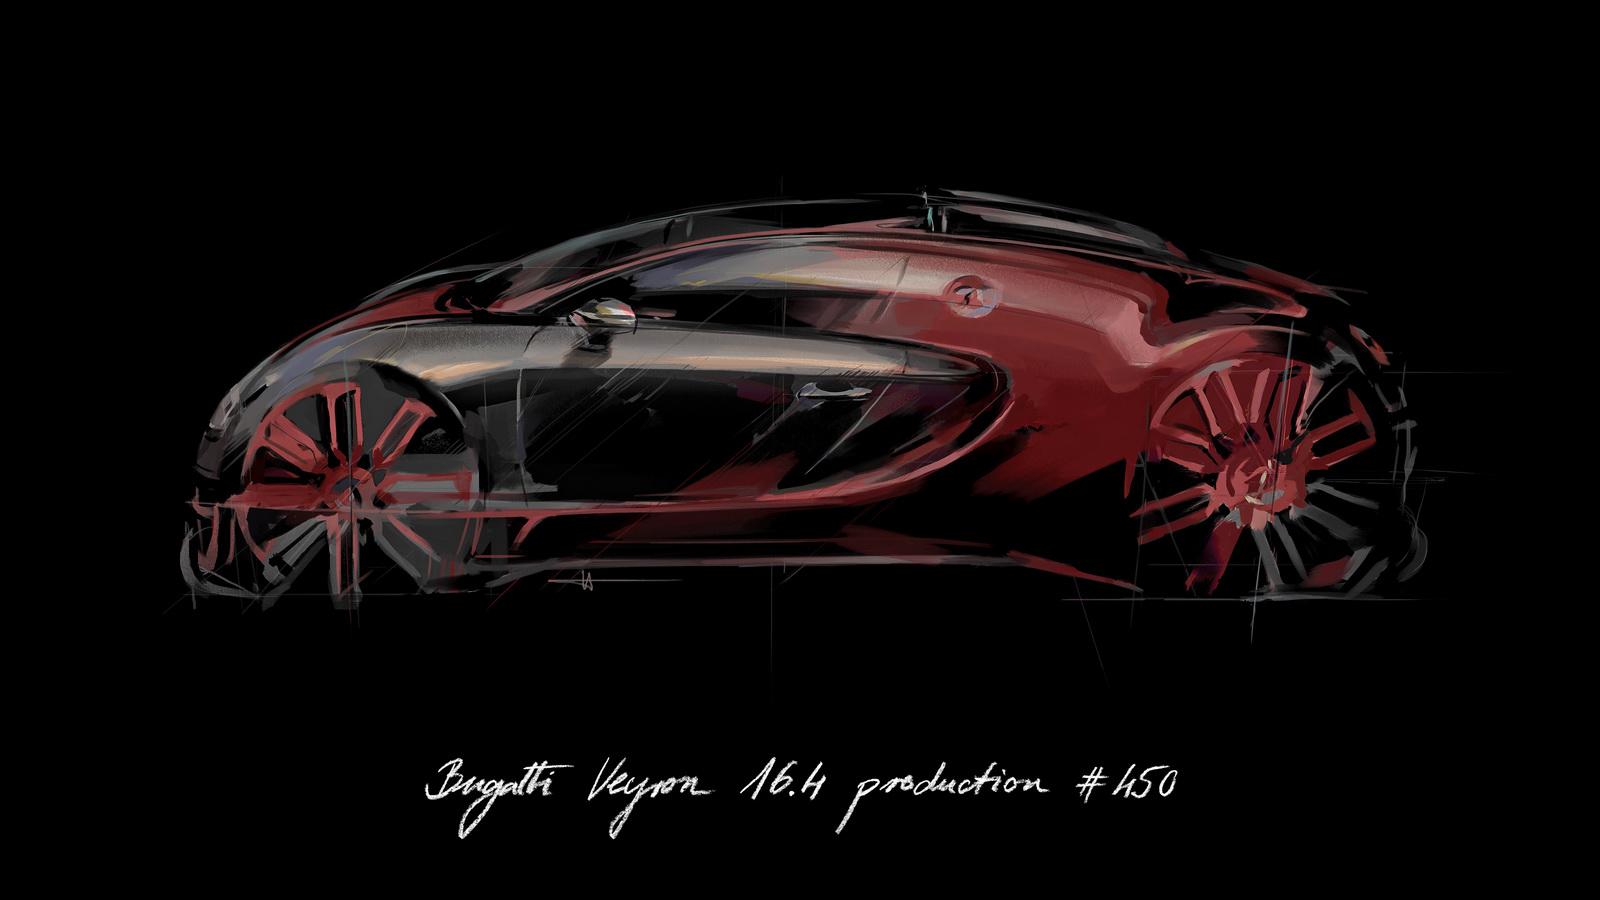 Bugatti-Veyron-La-Finale-19